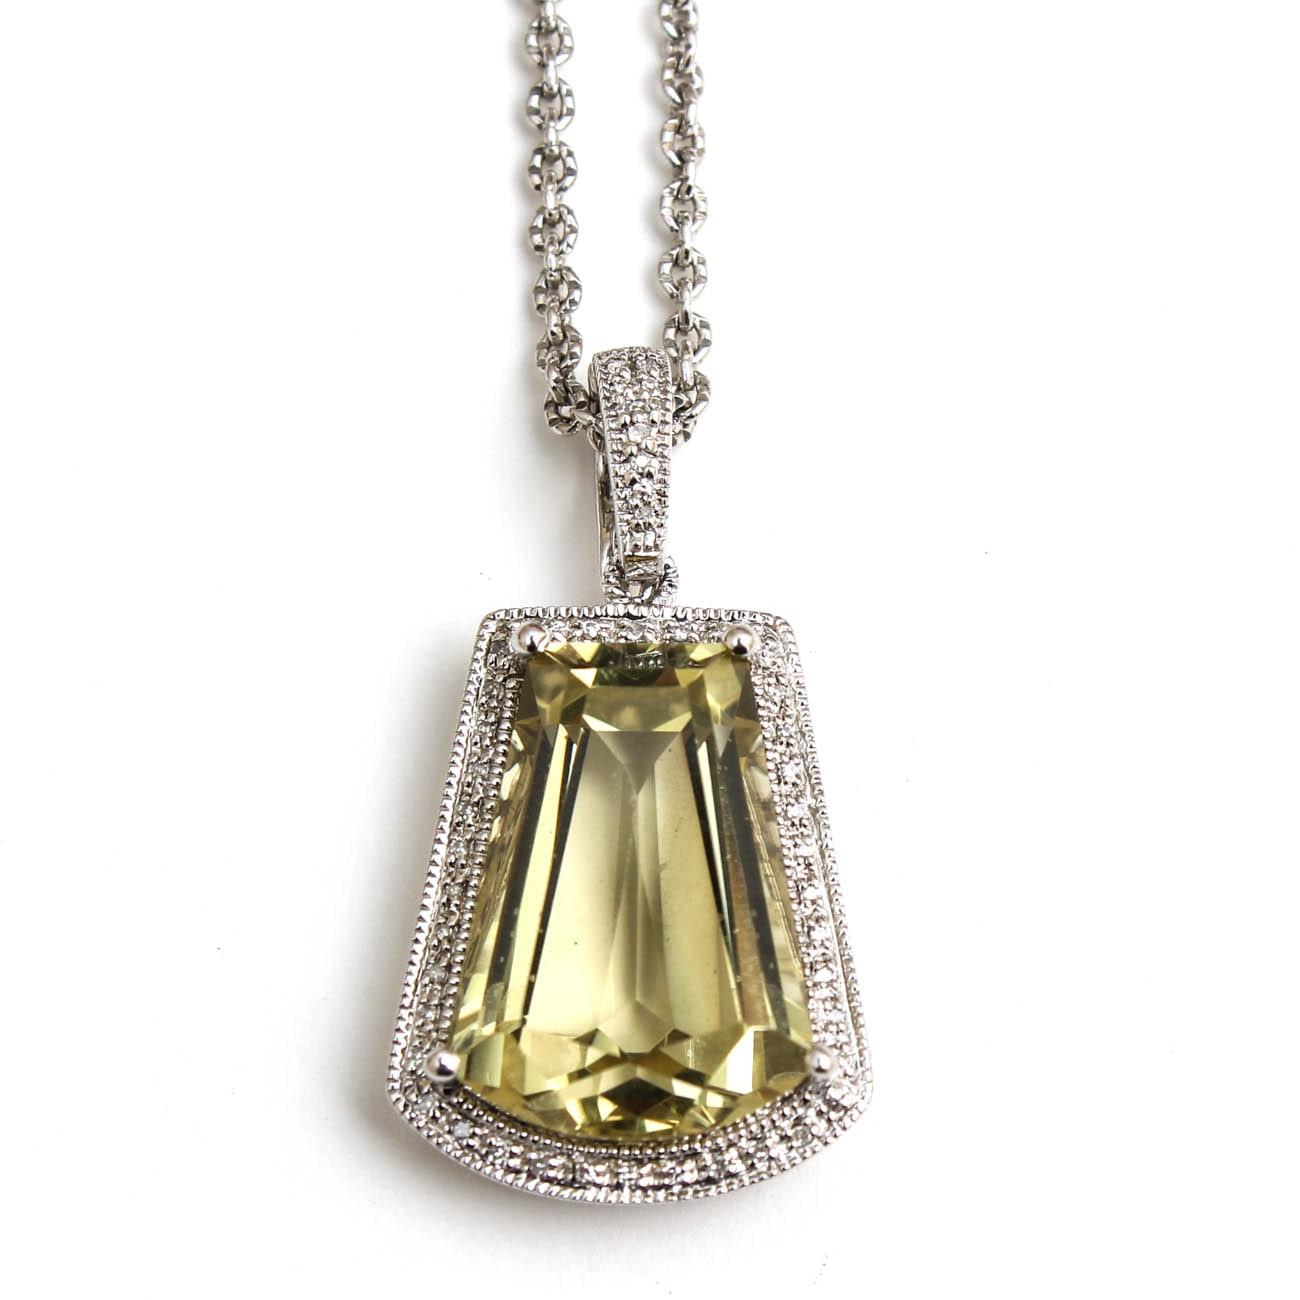 Sterling Silver 16.00 CT Lemon Citrine and Diamond Pendant Necklace